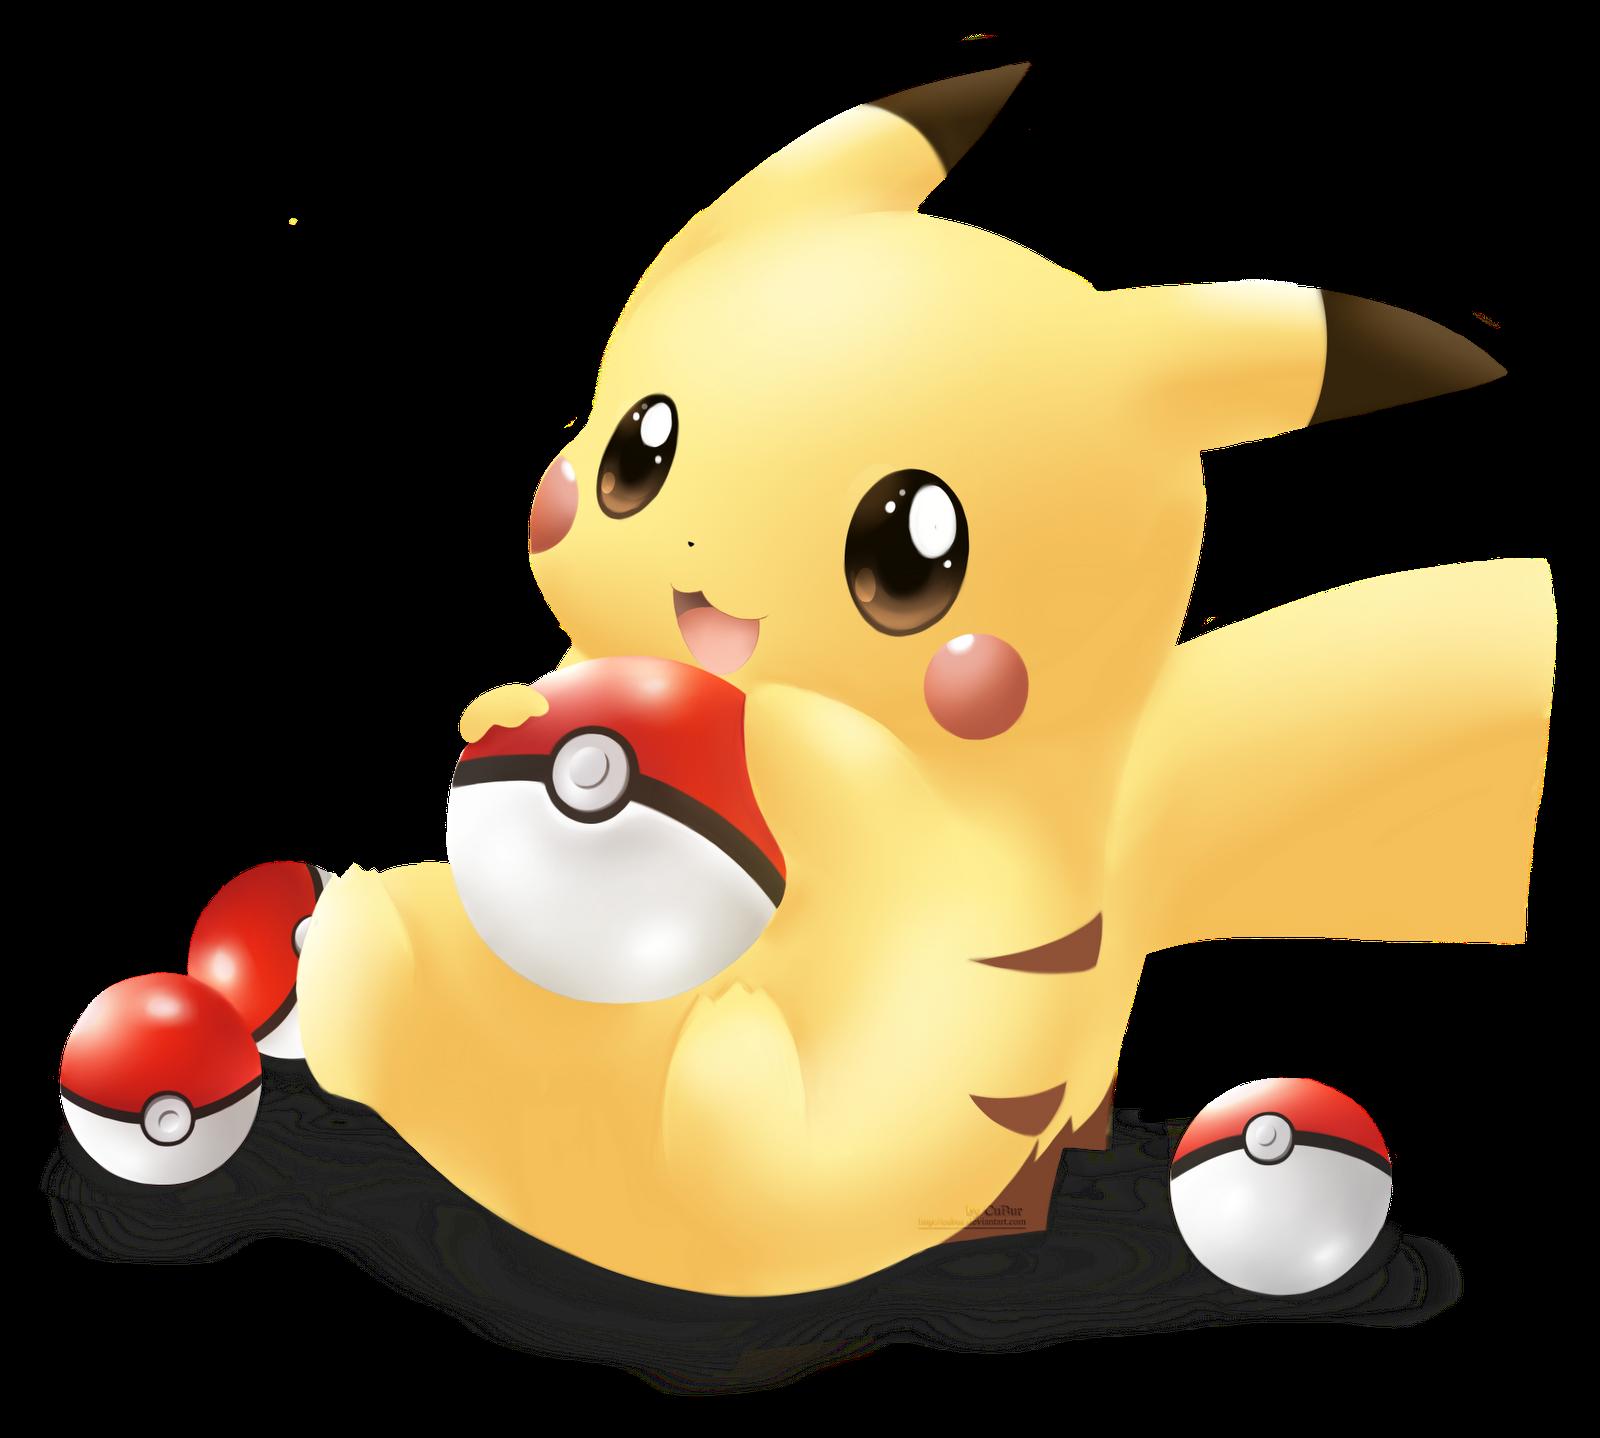 Cubur drawings pika pika pikachu - Pikachu kawaii ...